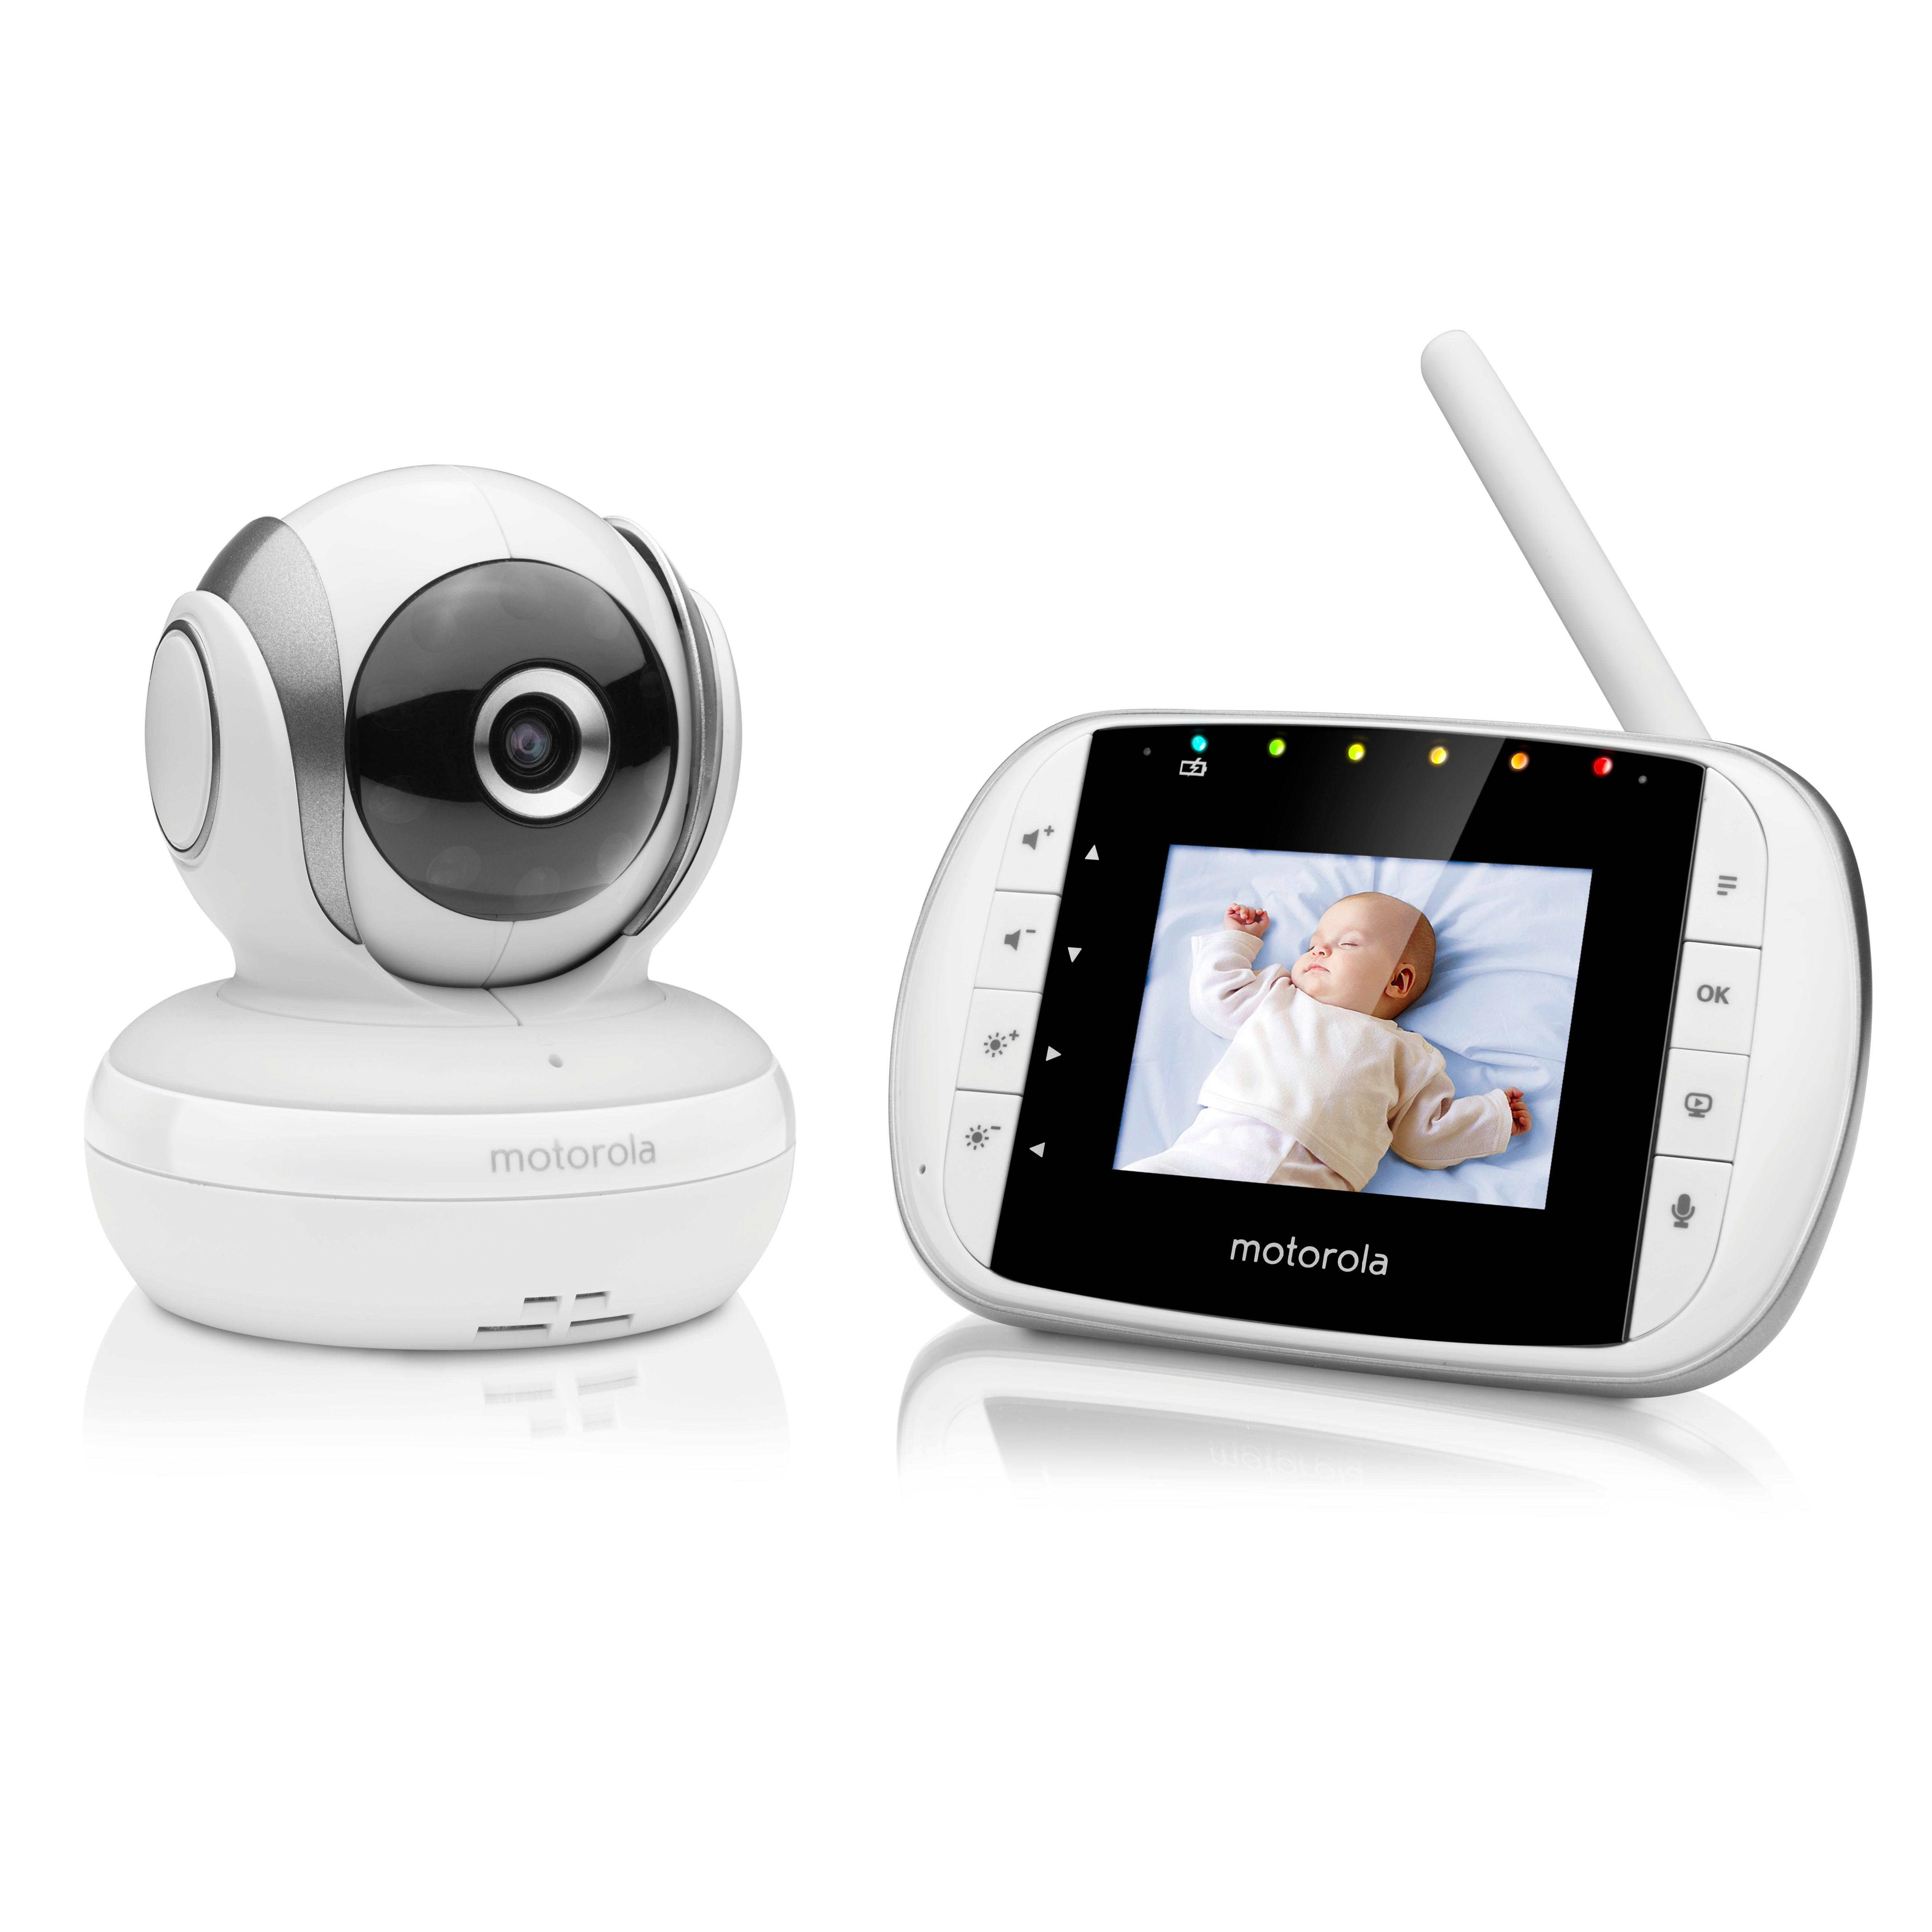 motorola baby mbp 33s video babyphone wireless baby berwachungskamera temperatursensor und. Black Bedroom Furniture Sets. Home Design Ideas